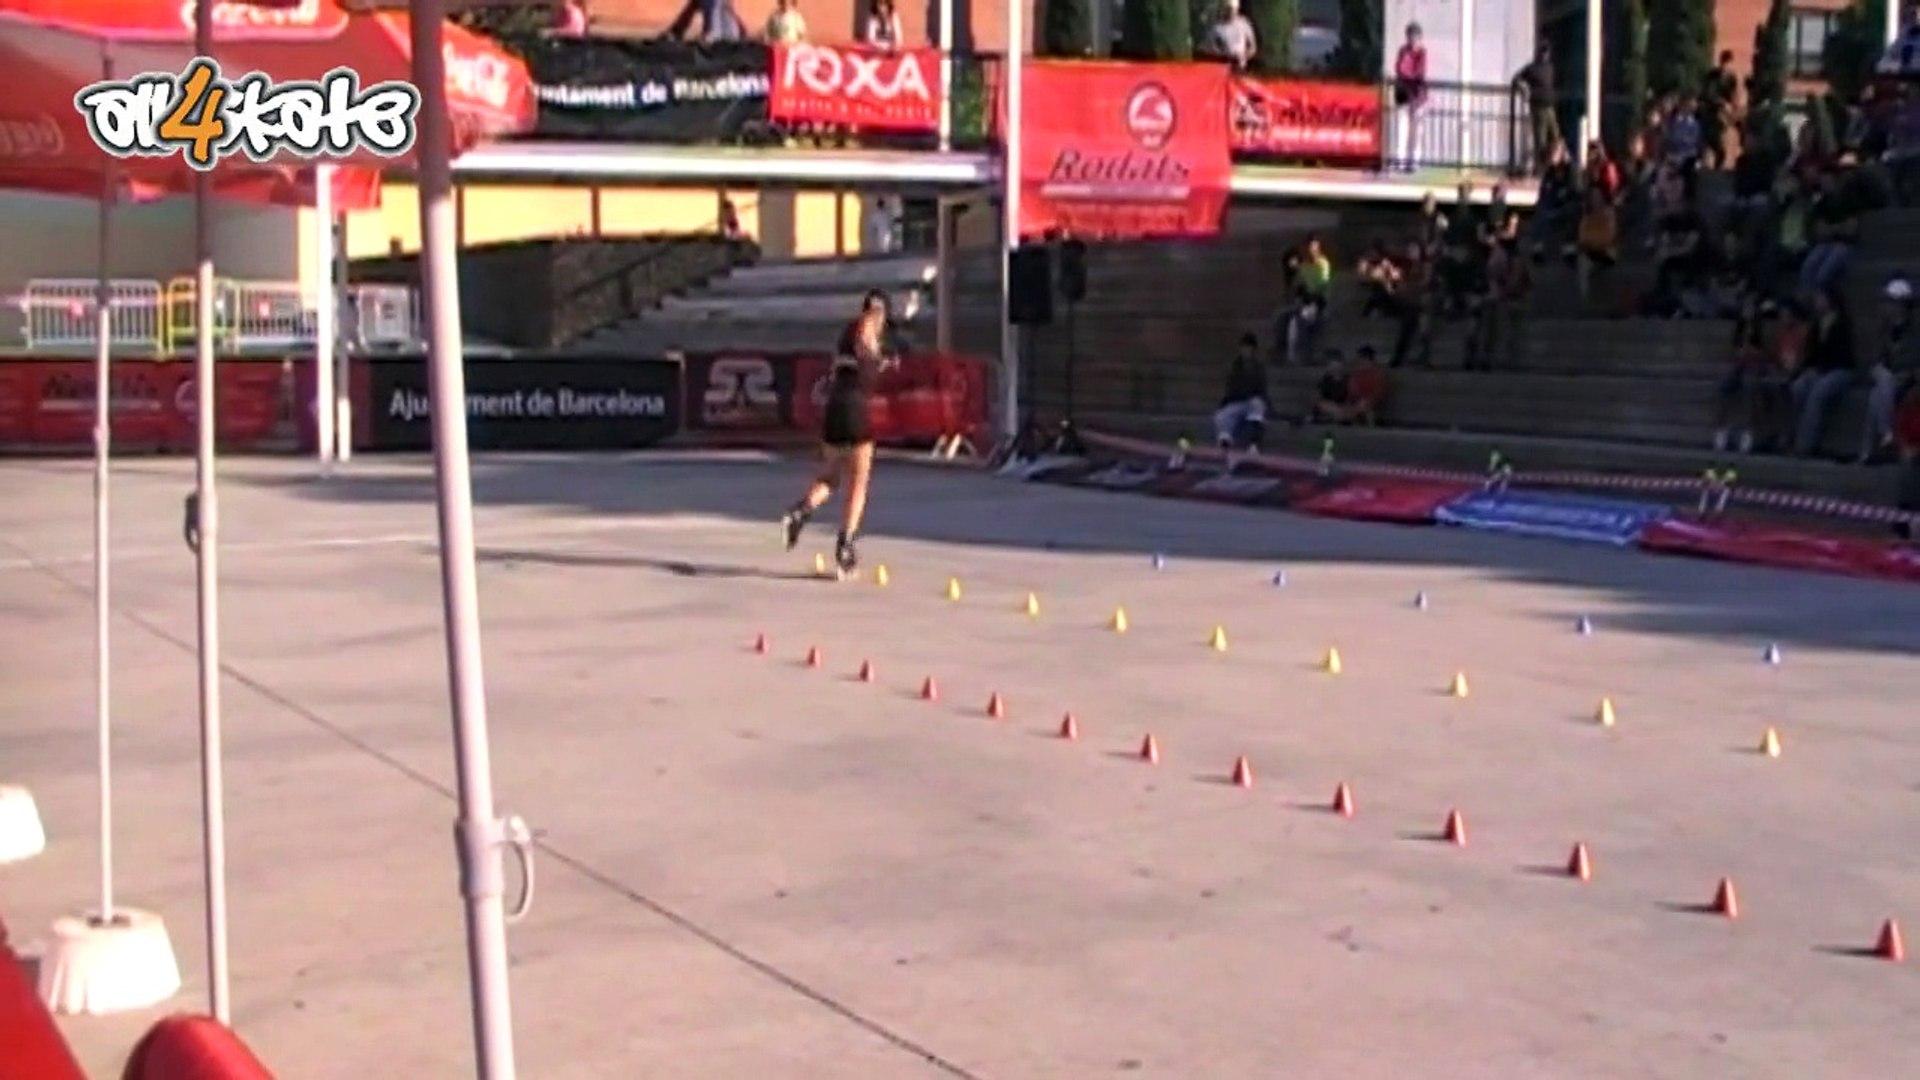 IFSA - Barcelona 2009 - Lejeune Caroline - Freestyle slalom Woman